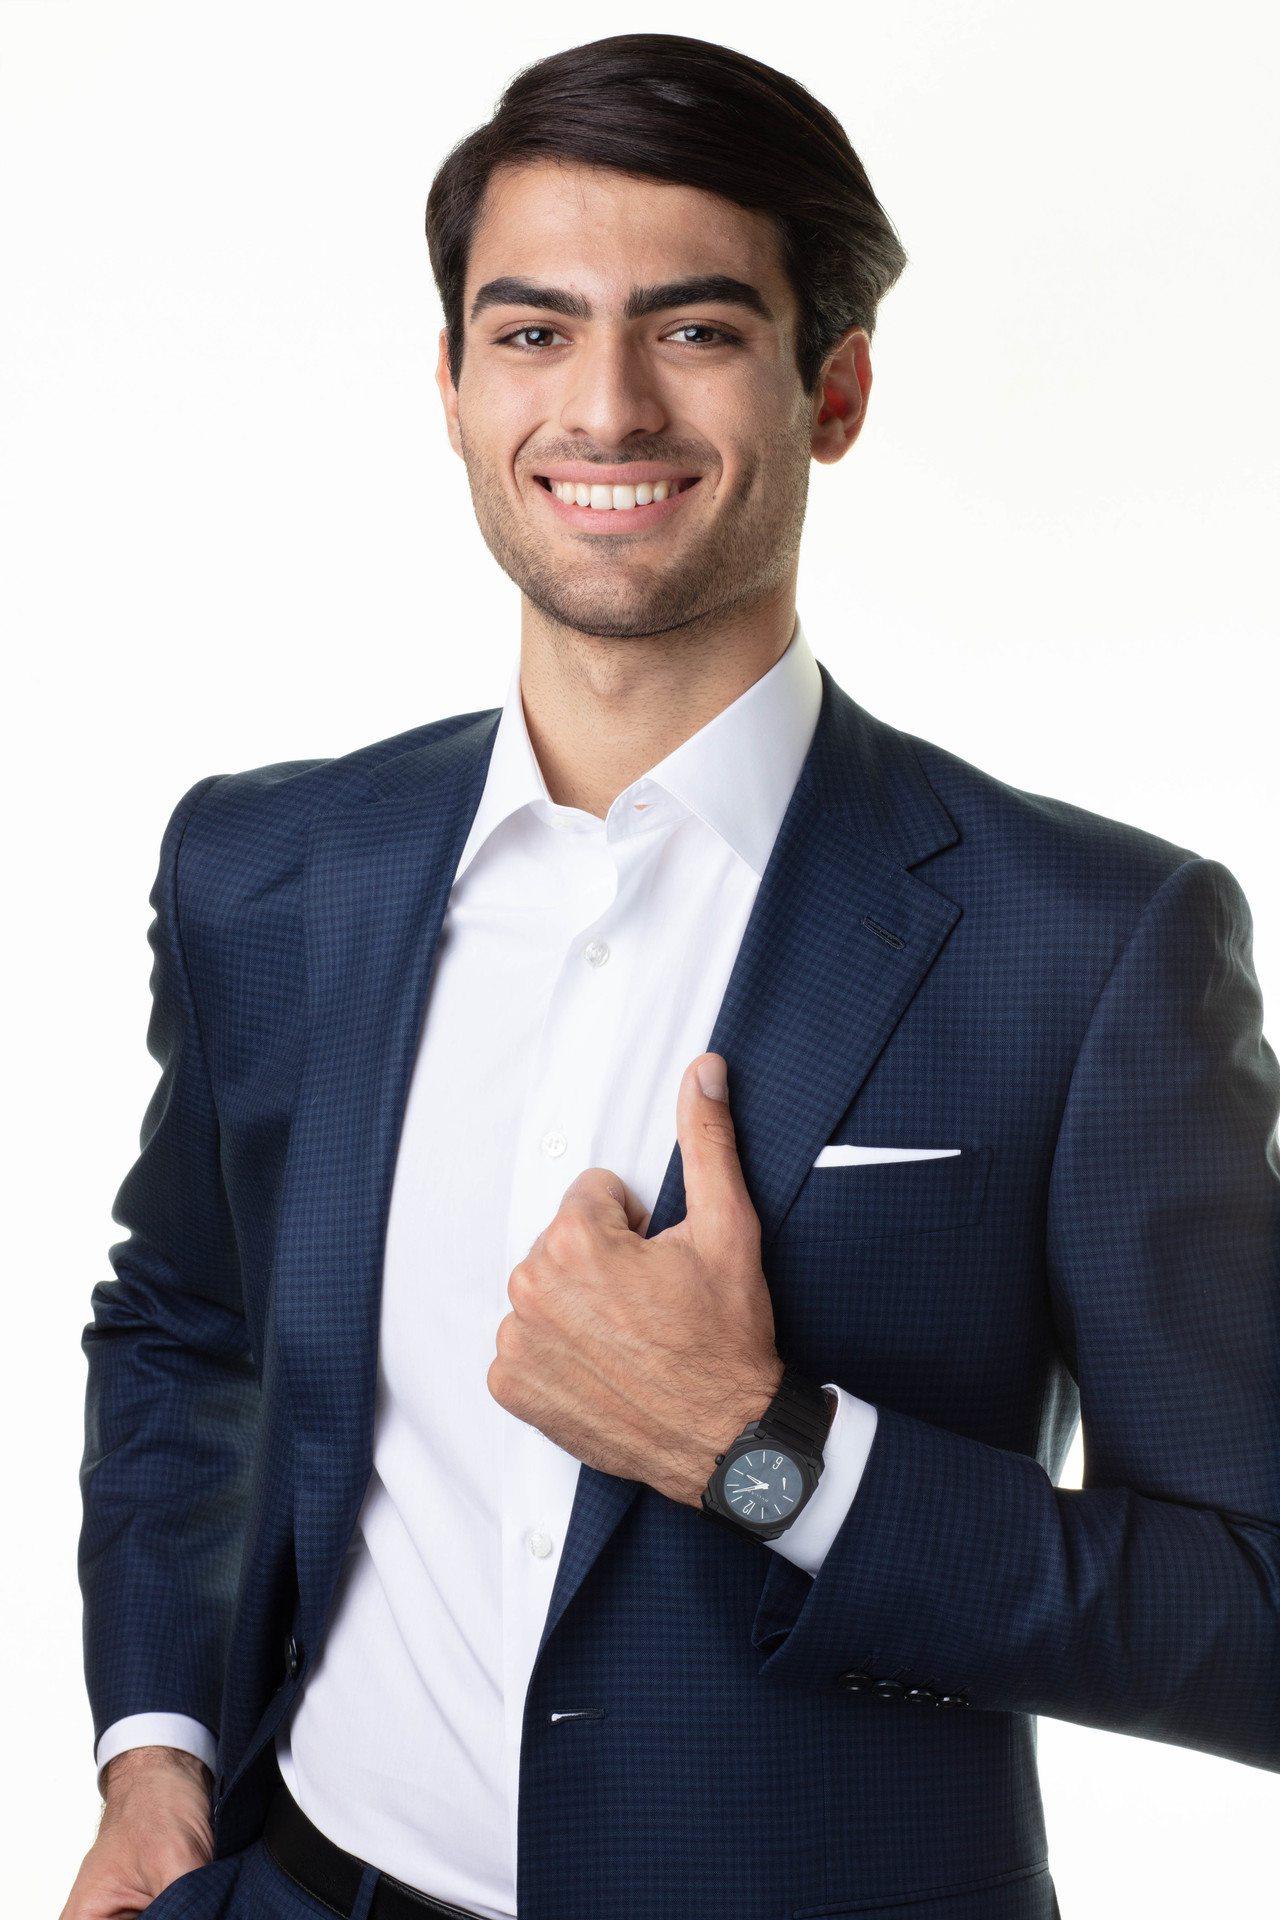 寶格麗品牌大使Matteo BOCELLI經典詮釋Octo Finissimo自...